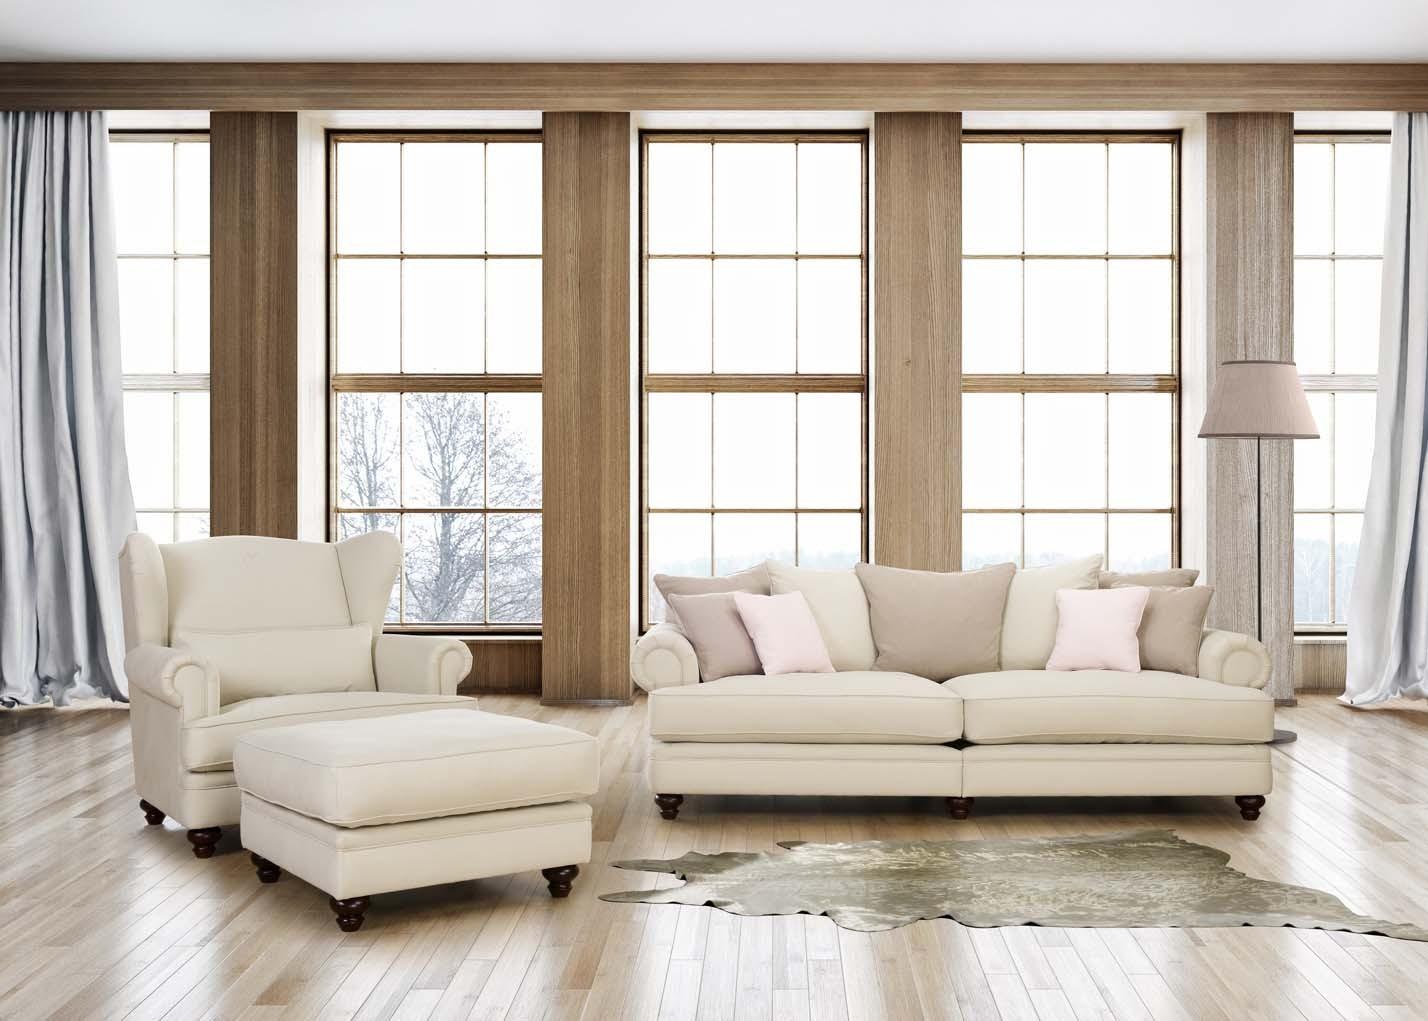 air sofa chair price in stan costco mason queen sleeper cubick pufa tapicerowana na taras i do ogrodu